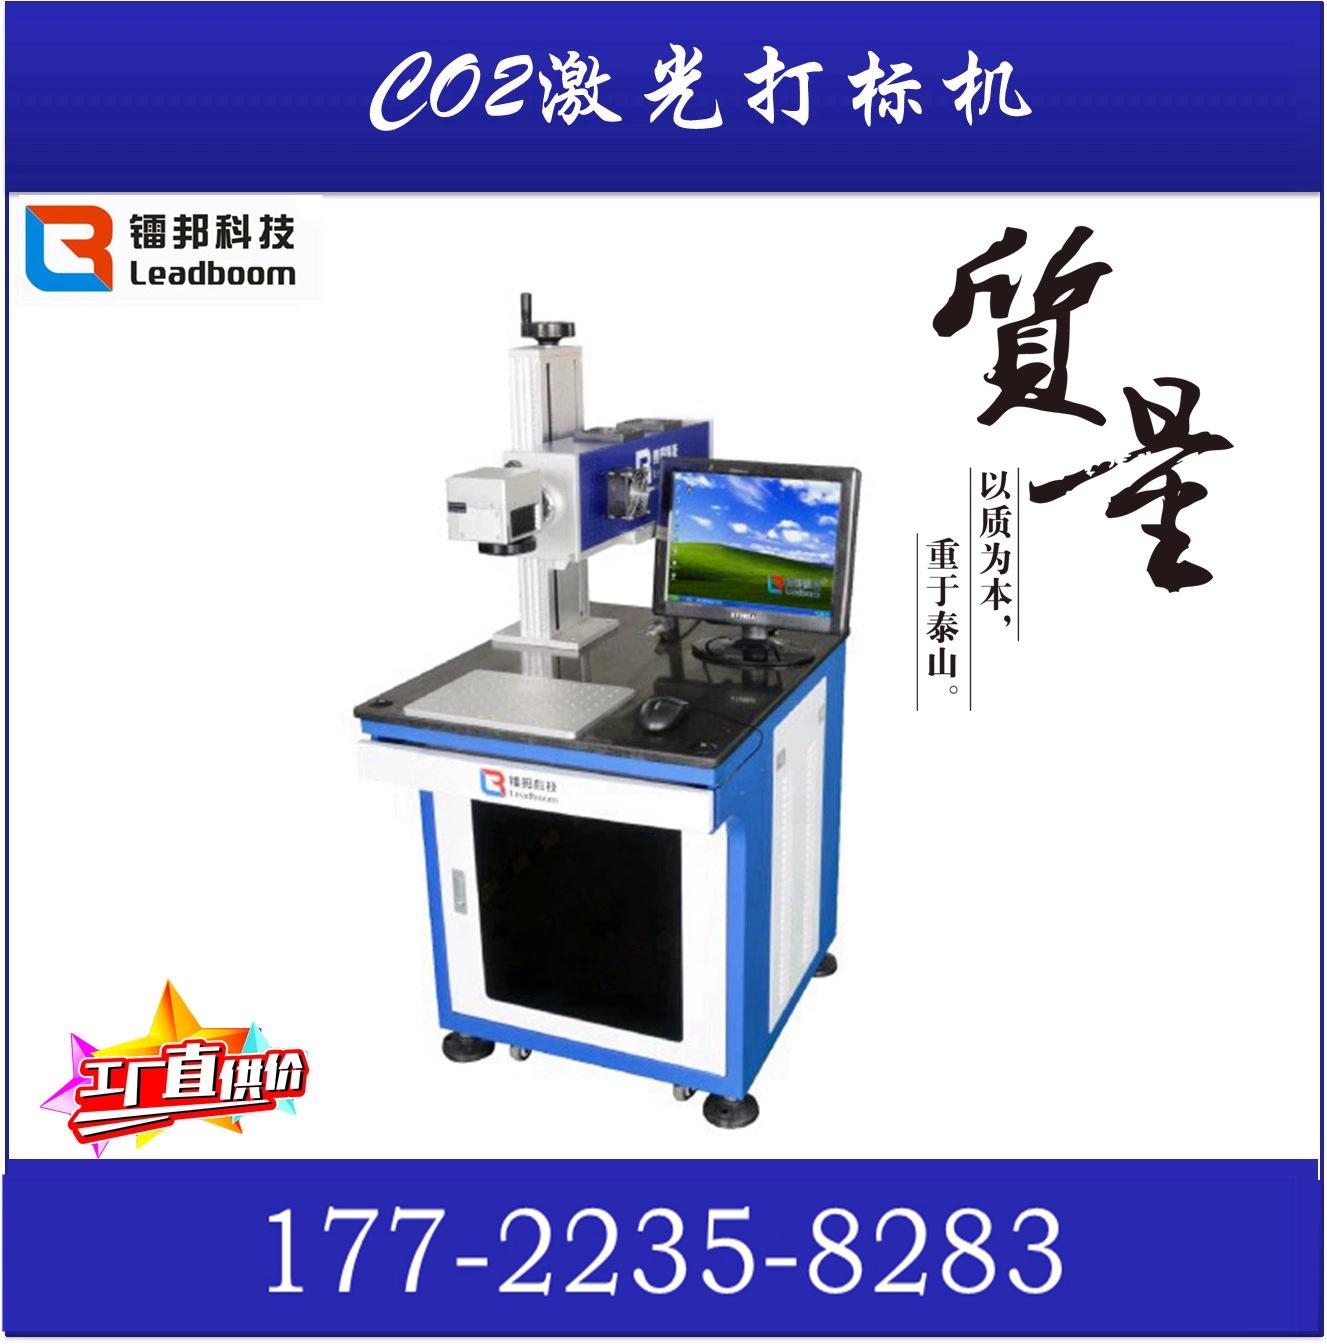 CO2激光打标机